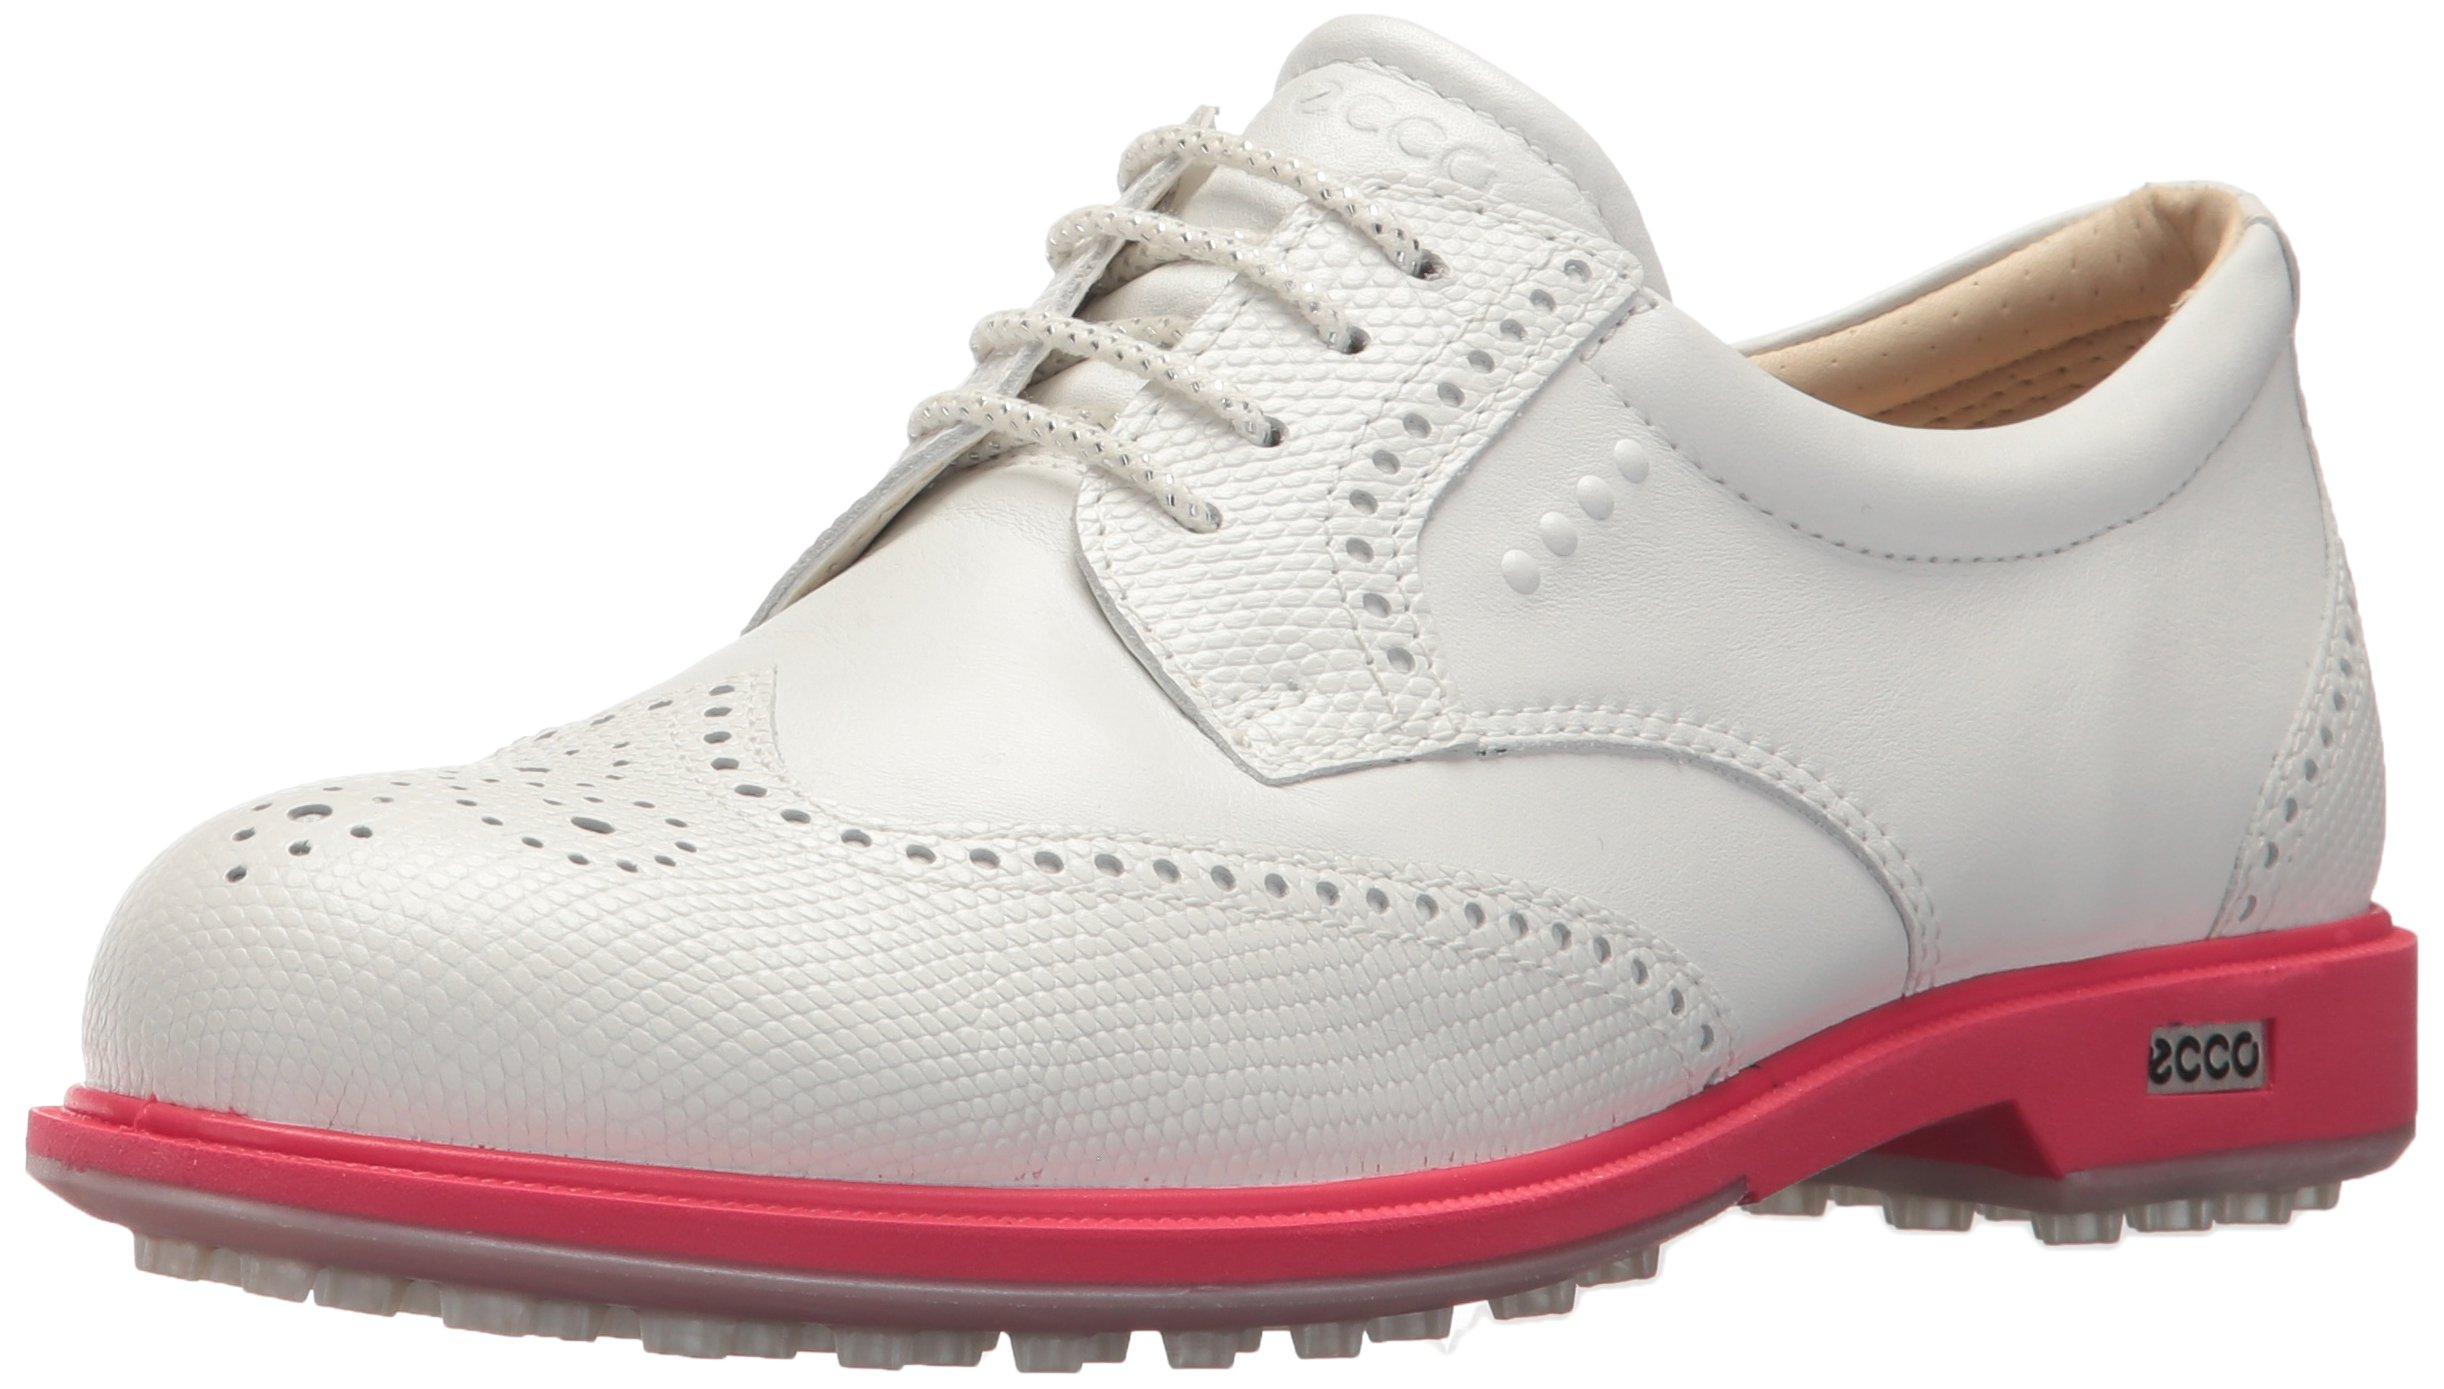 ECCO Women's Classic Hybrid Golf Shoe, White/Teaberry, 37 M EU (6-6.5 US) by ECCO